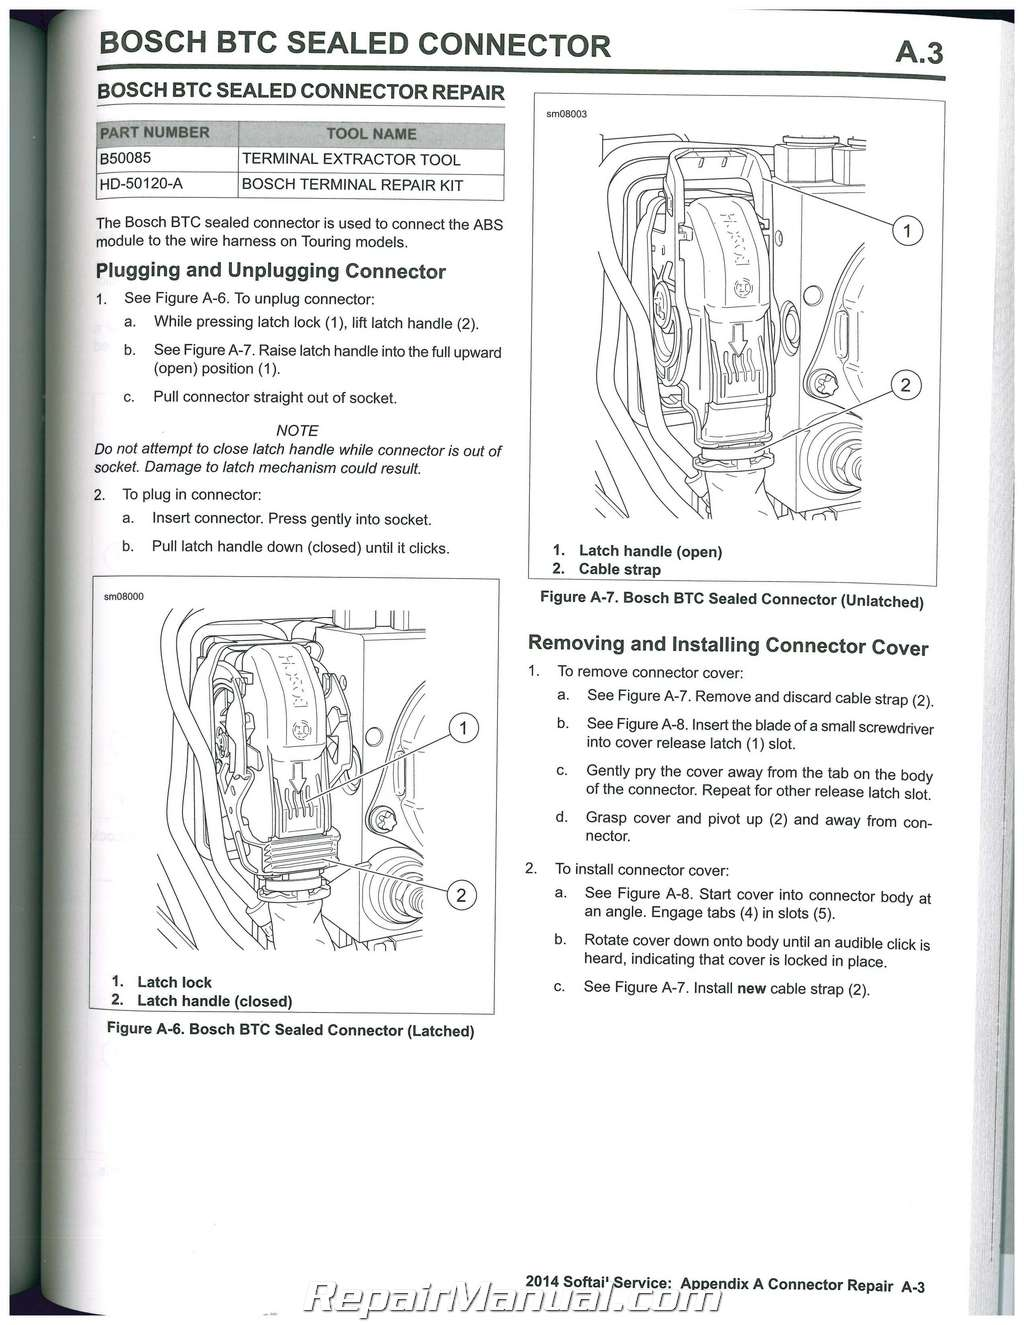 2014 Harley Davidson Softail Motorcycle Service Manual